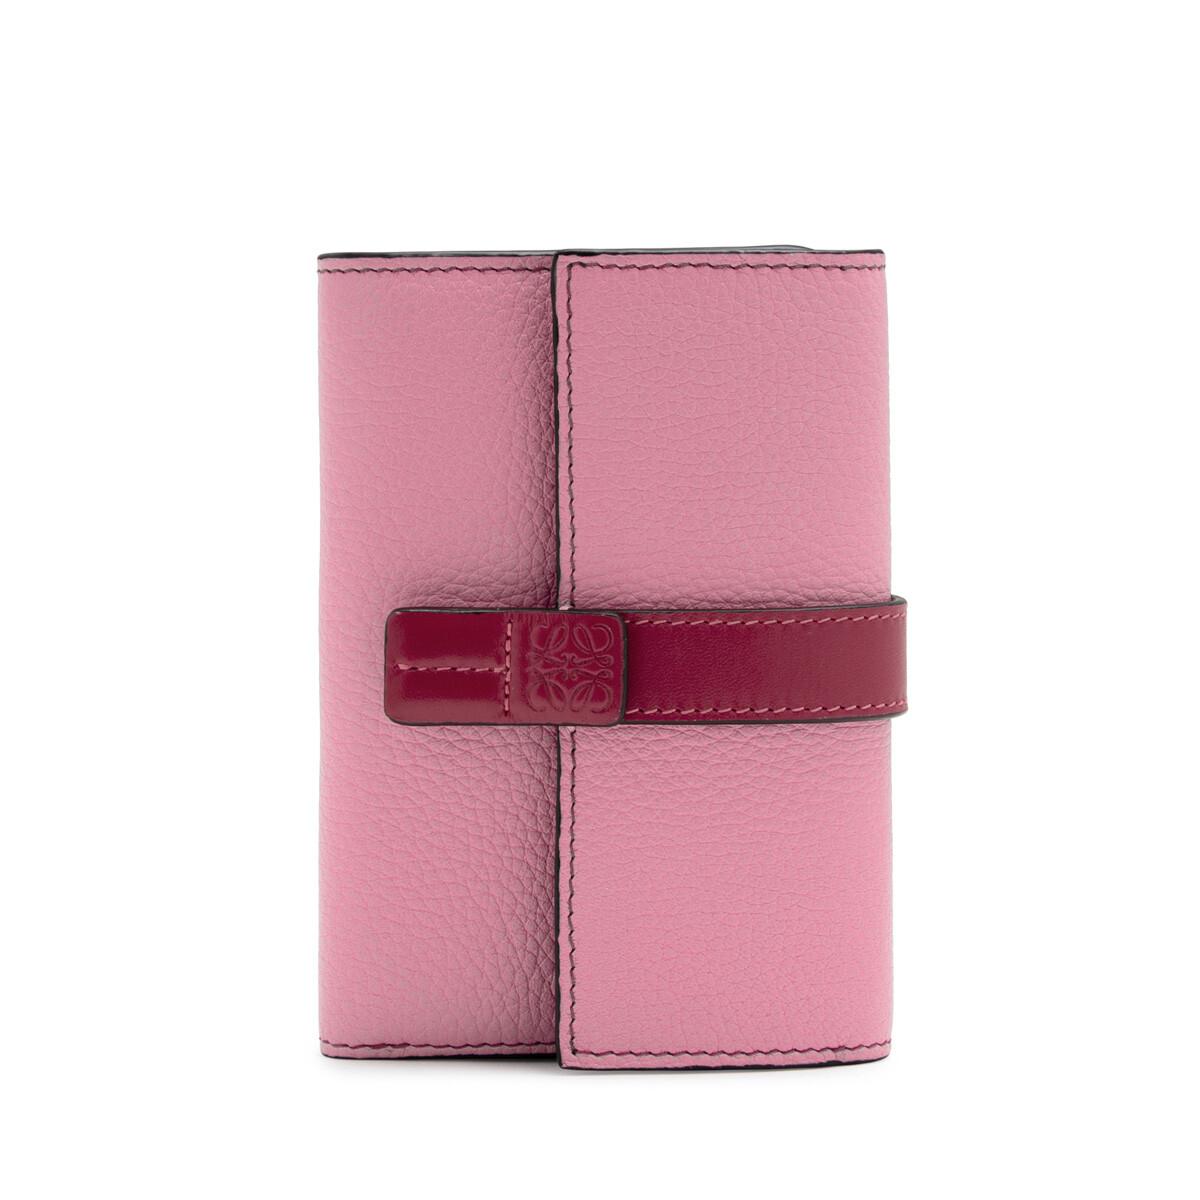 LOEWE Small Vertical Wallet Wild Rose/Raspberry front